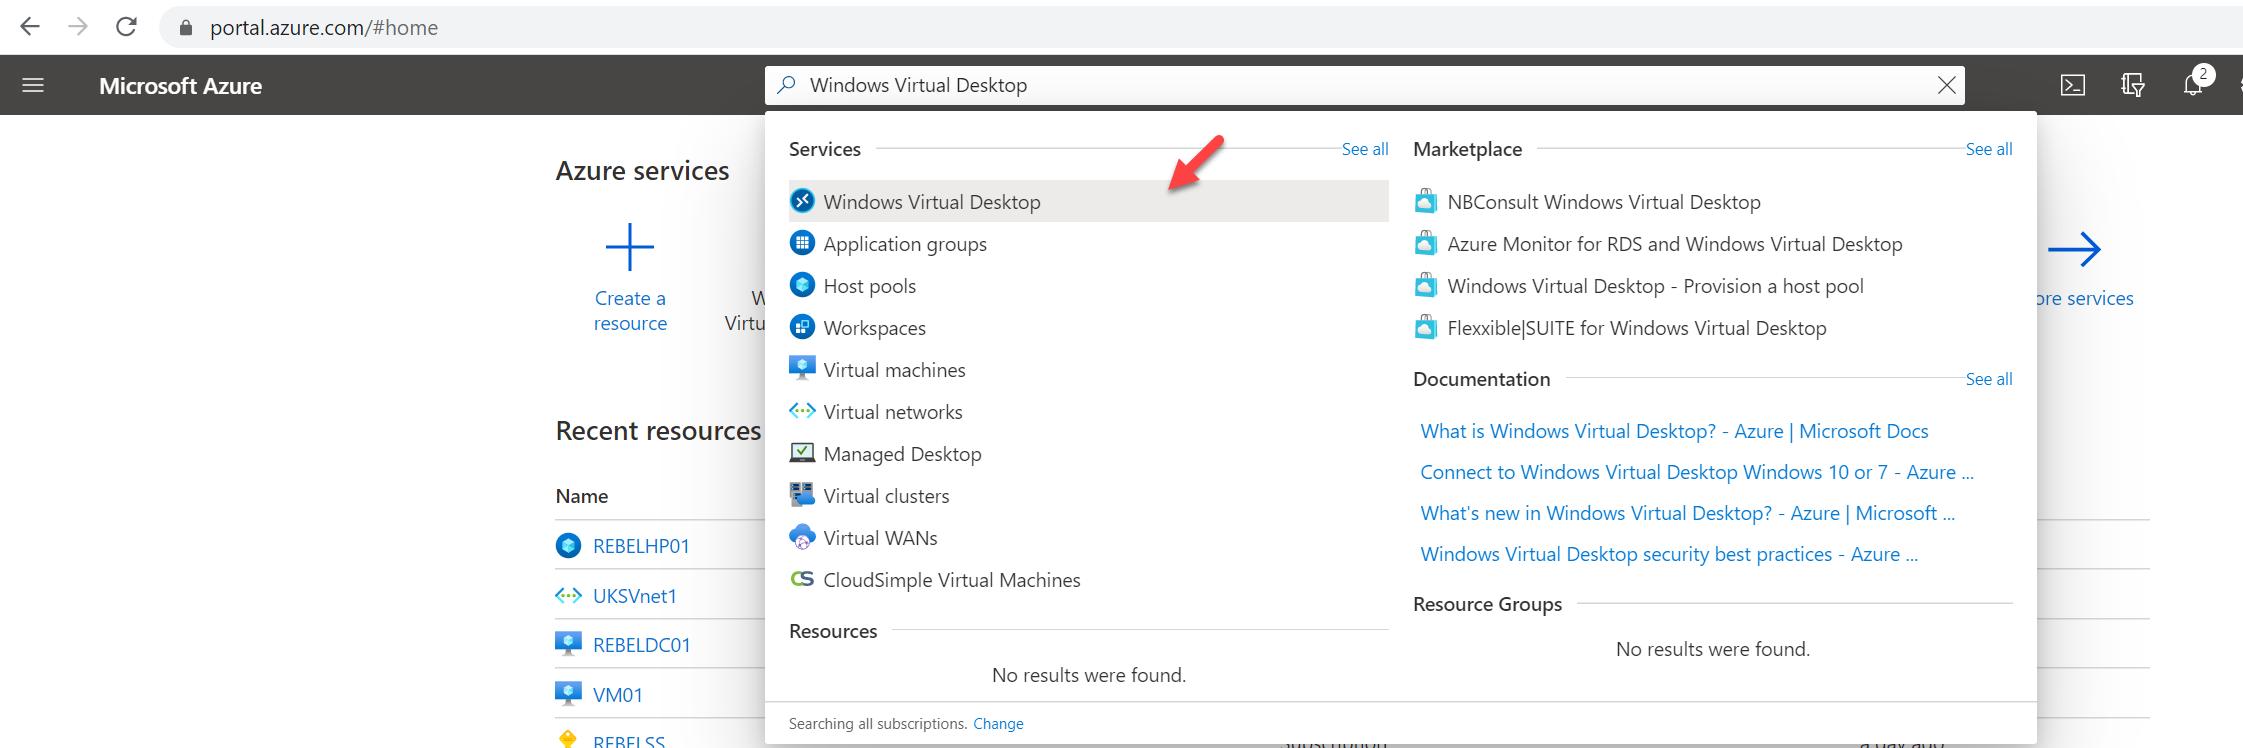 search for Windows Virtual Desktop service